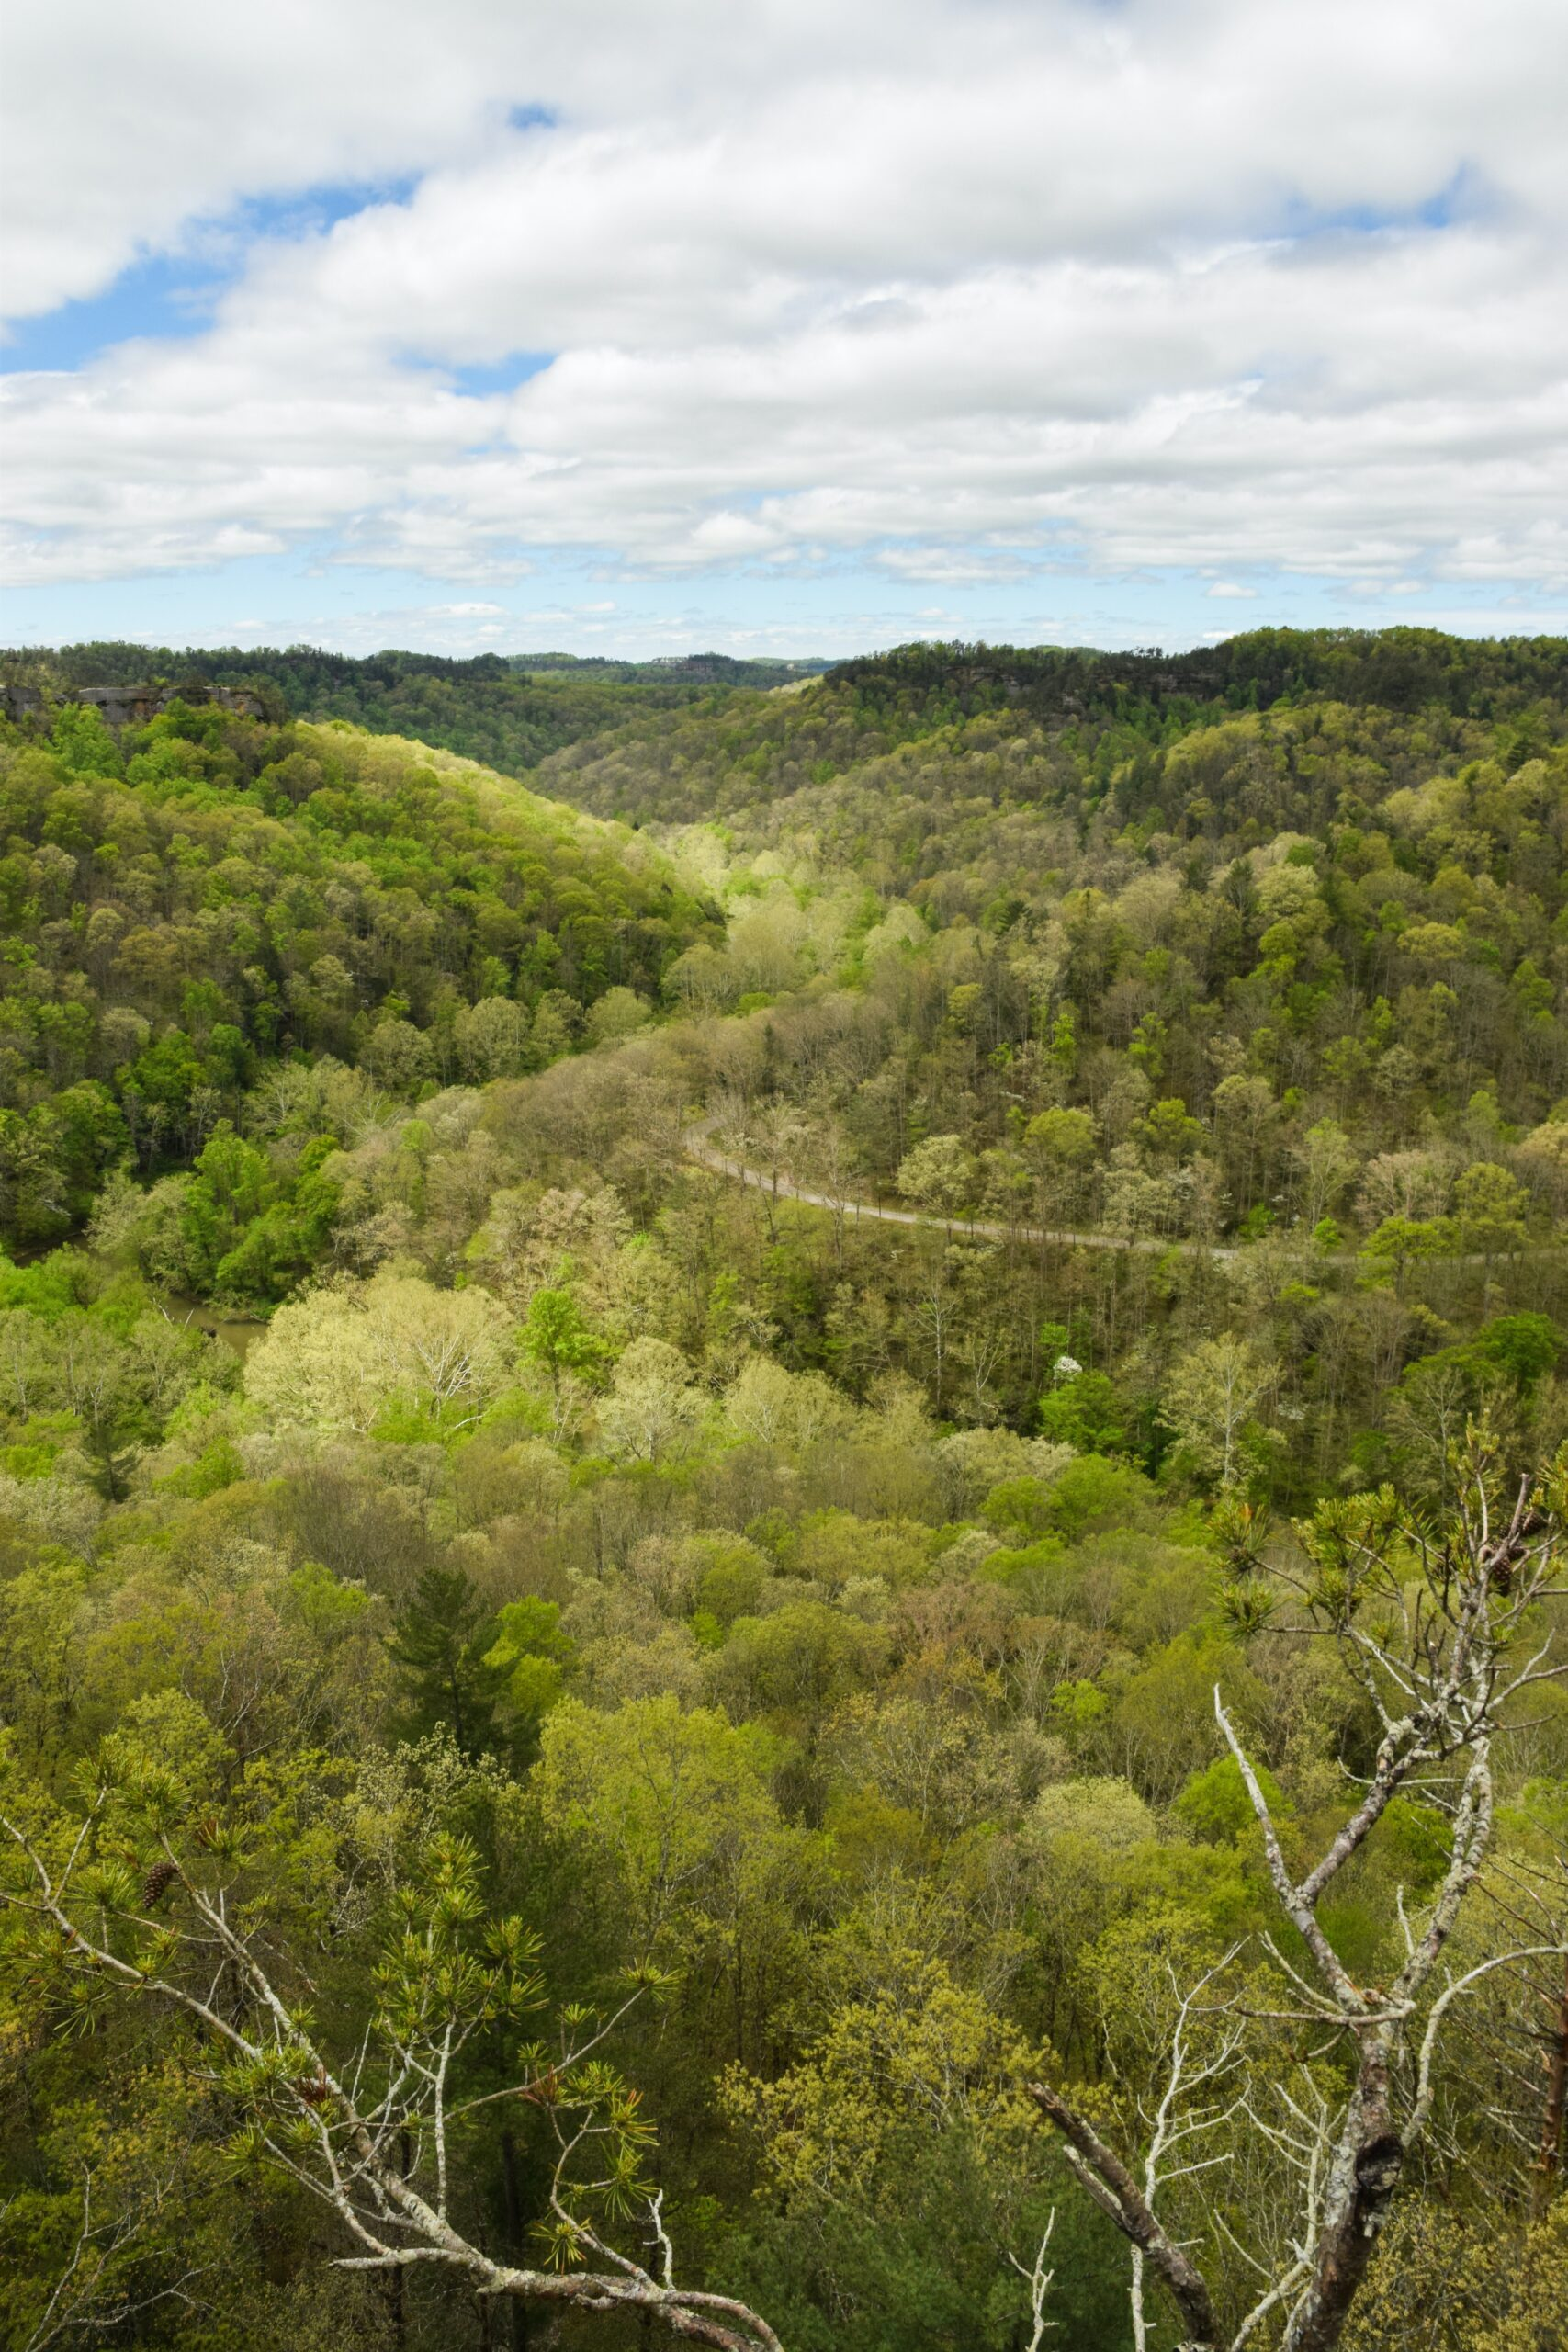 amy-baugess-Mountain valley with lush kentucky greenunsplash